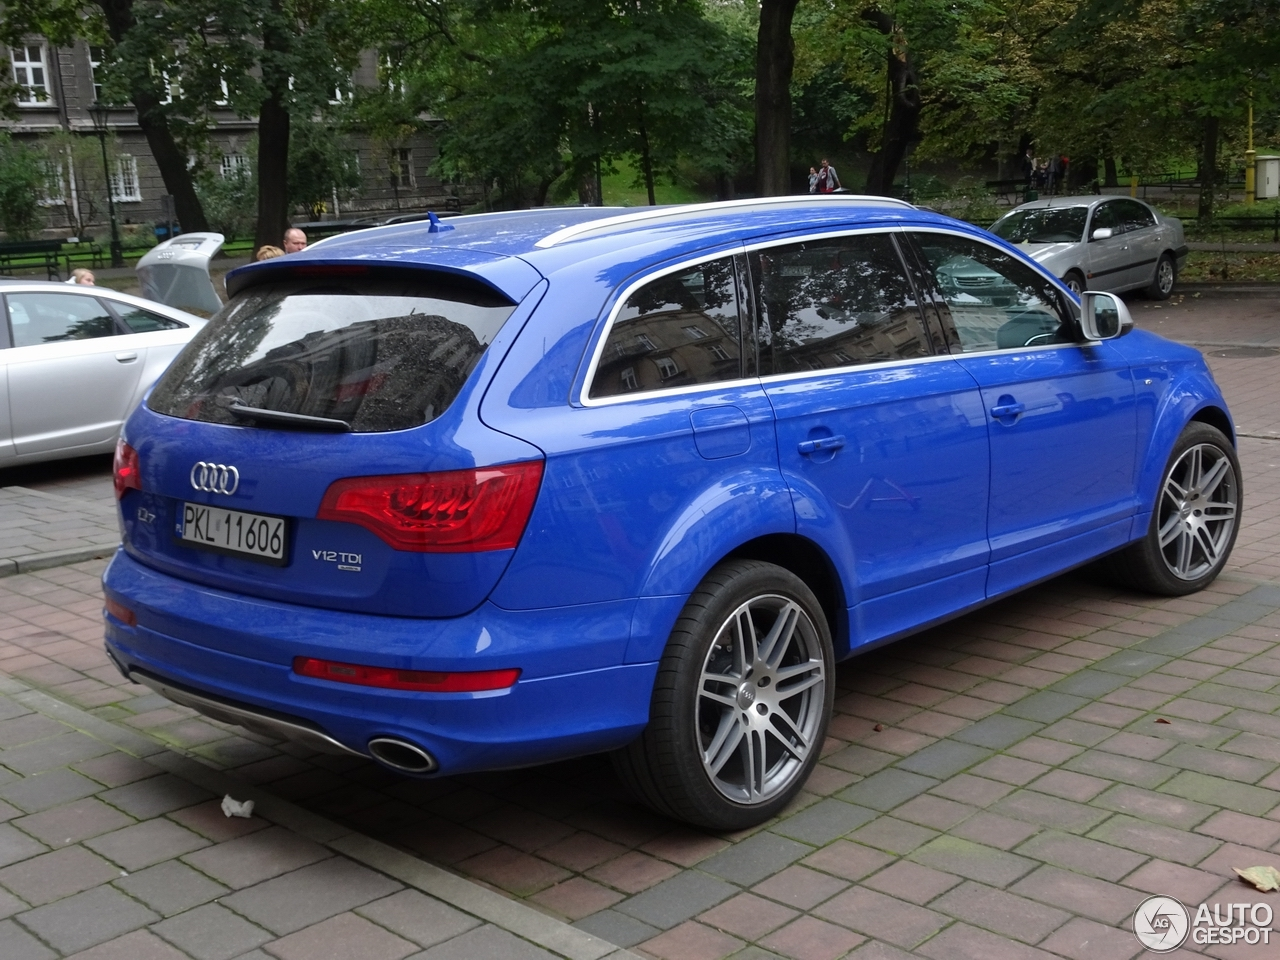 Audi Q7 V12 TDI - 30 September 2016 - Autogespot